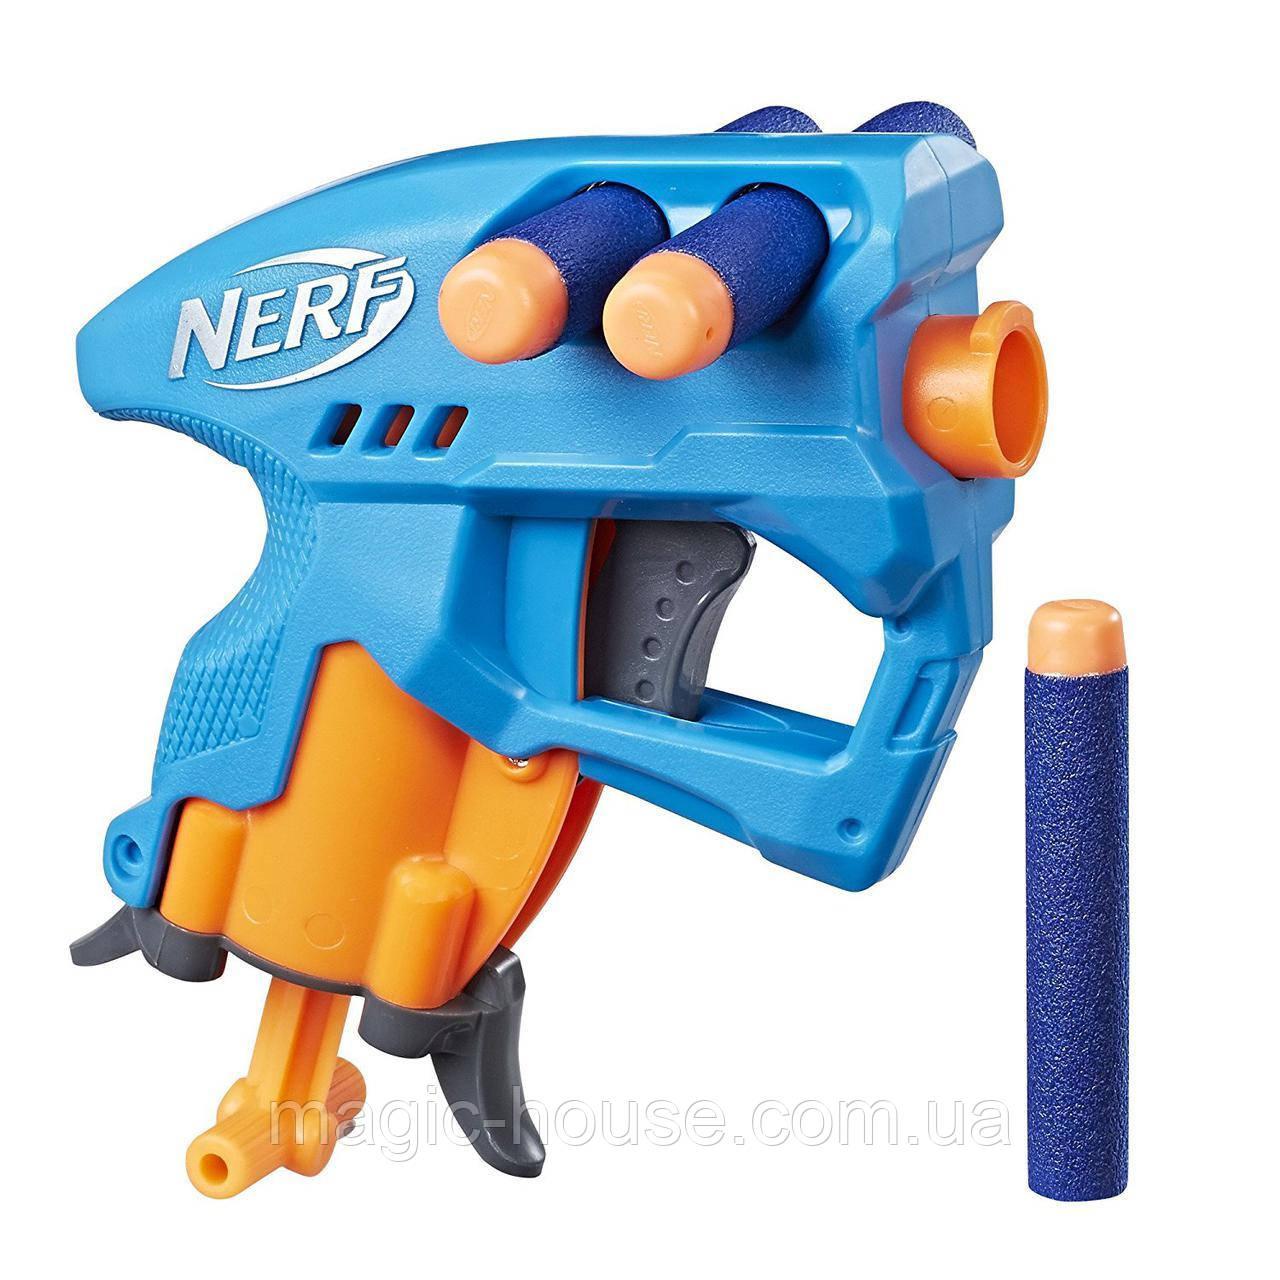 Бластер Нерф Нано Фаер (Голубой)Nerf N-Strike NanoFire (blue)